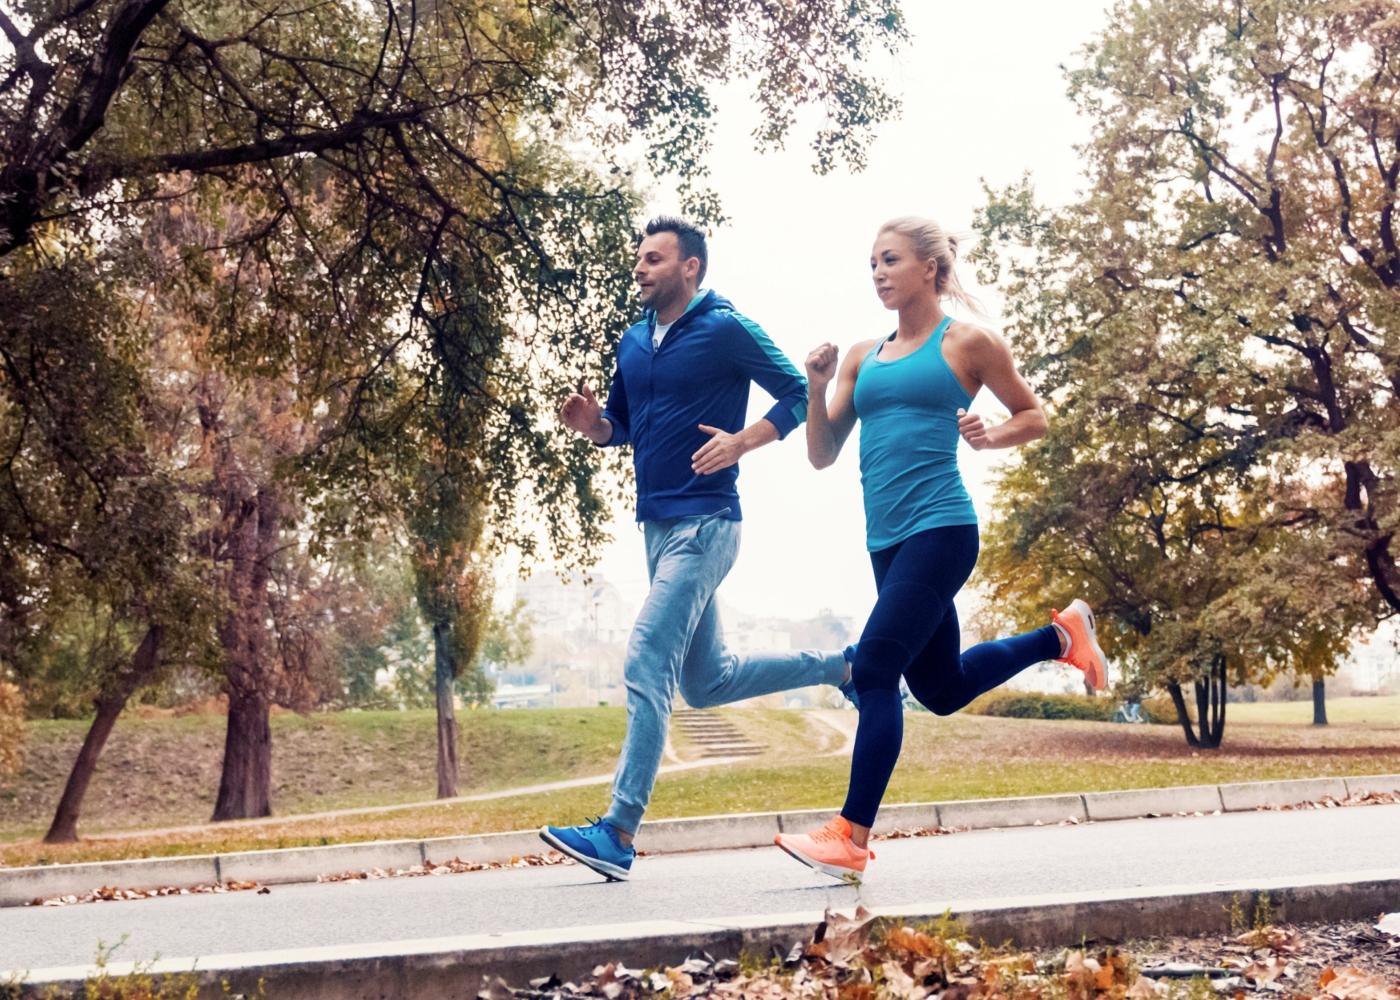 Casal a fazer a sua corrida matinal no parque